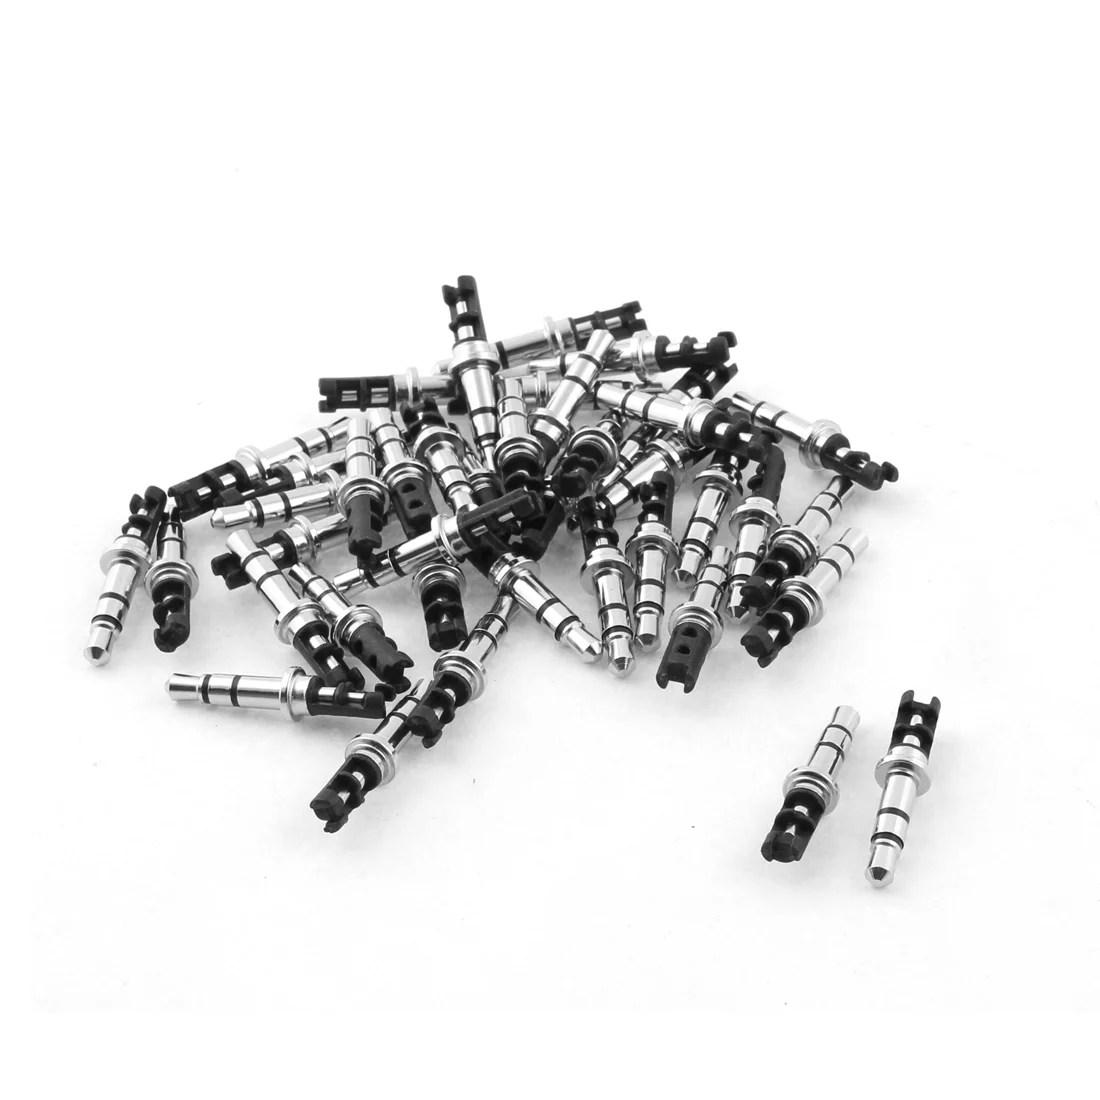 medium resolution of 3 5mm stereo male plug repair audio headphone jack solder connector black 40pcs